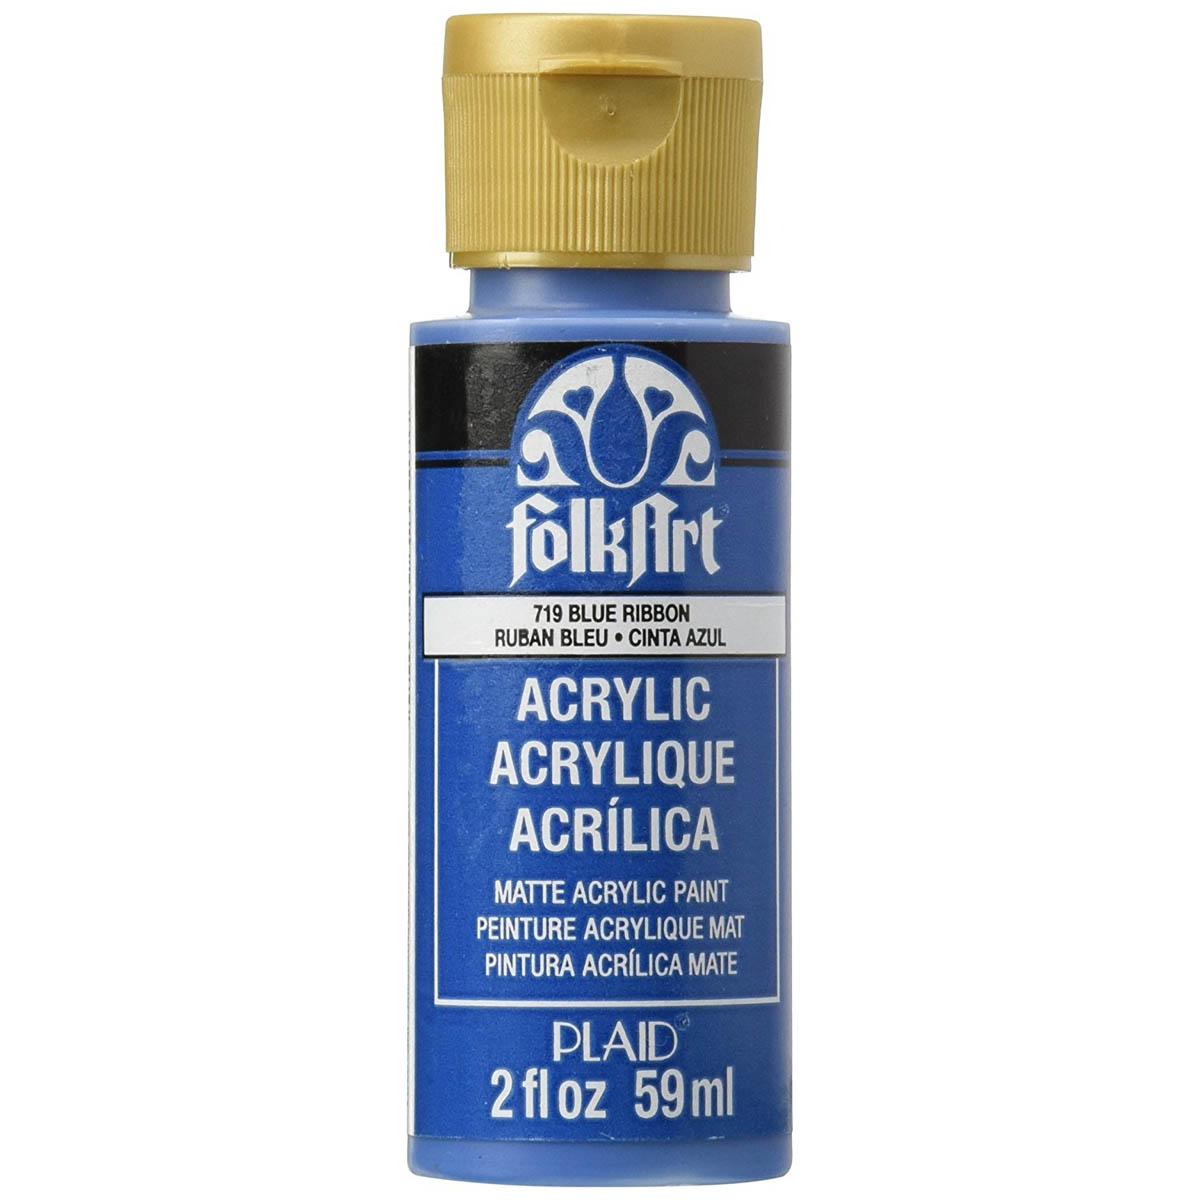 FolkArt ® Acrylic Colors - Blue Ribbon, 2 oz. - 719